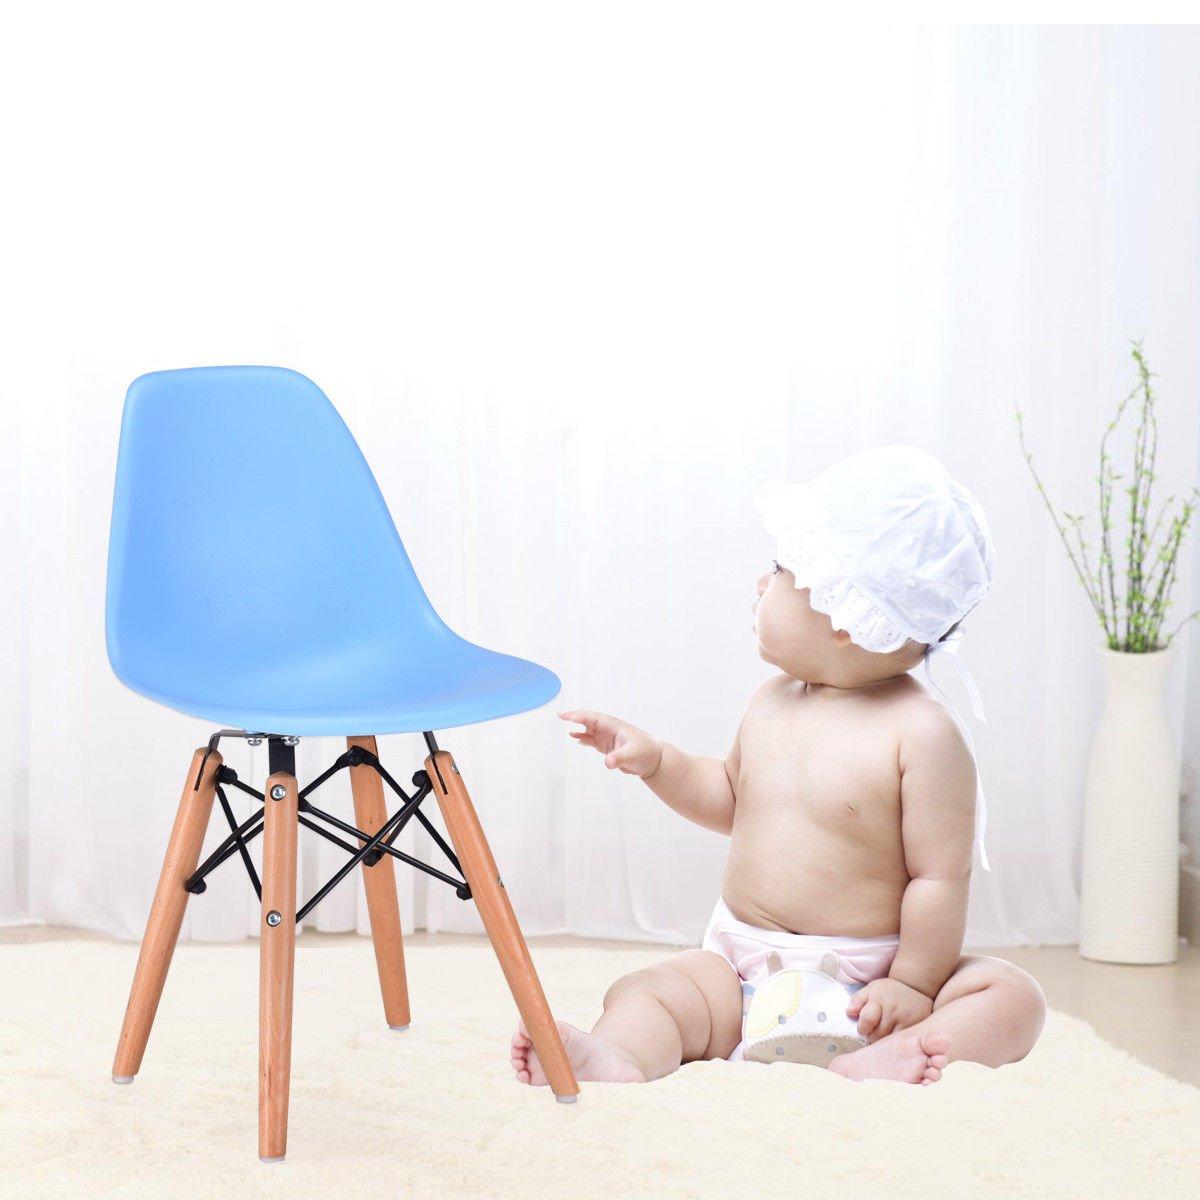 Amazon.com: costzon Kids Silla de comedor, moderna moldeado ...